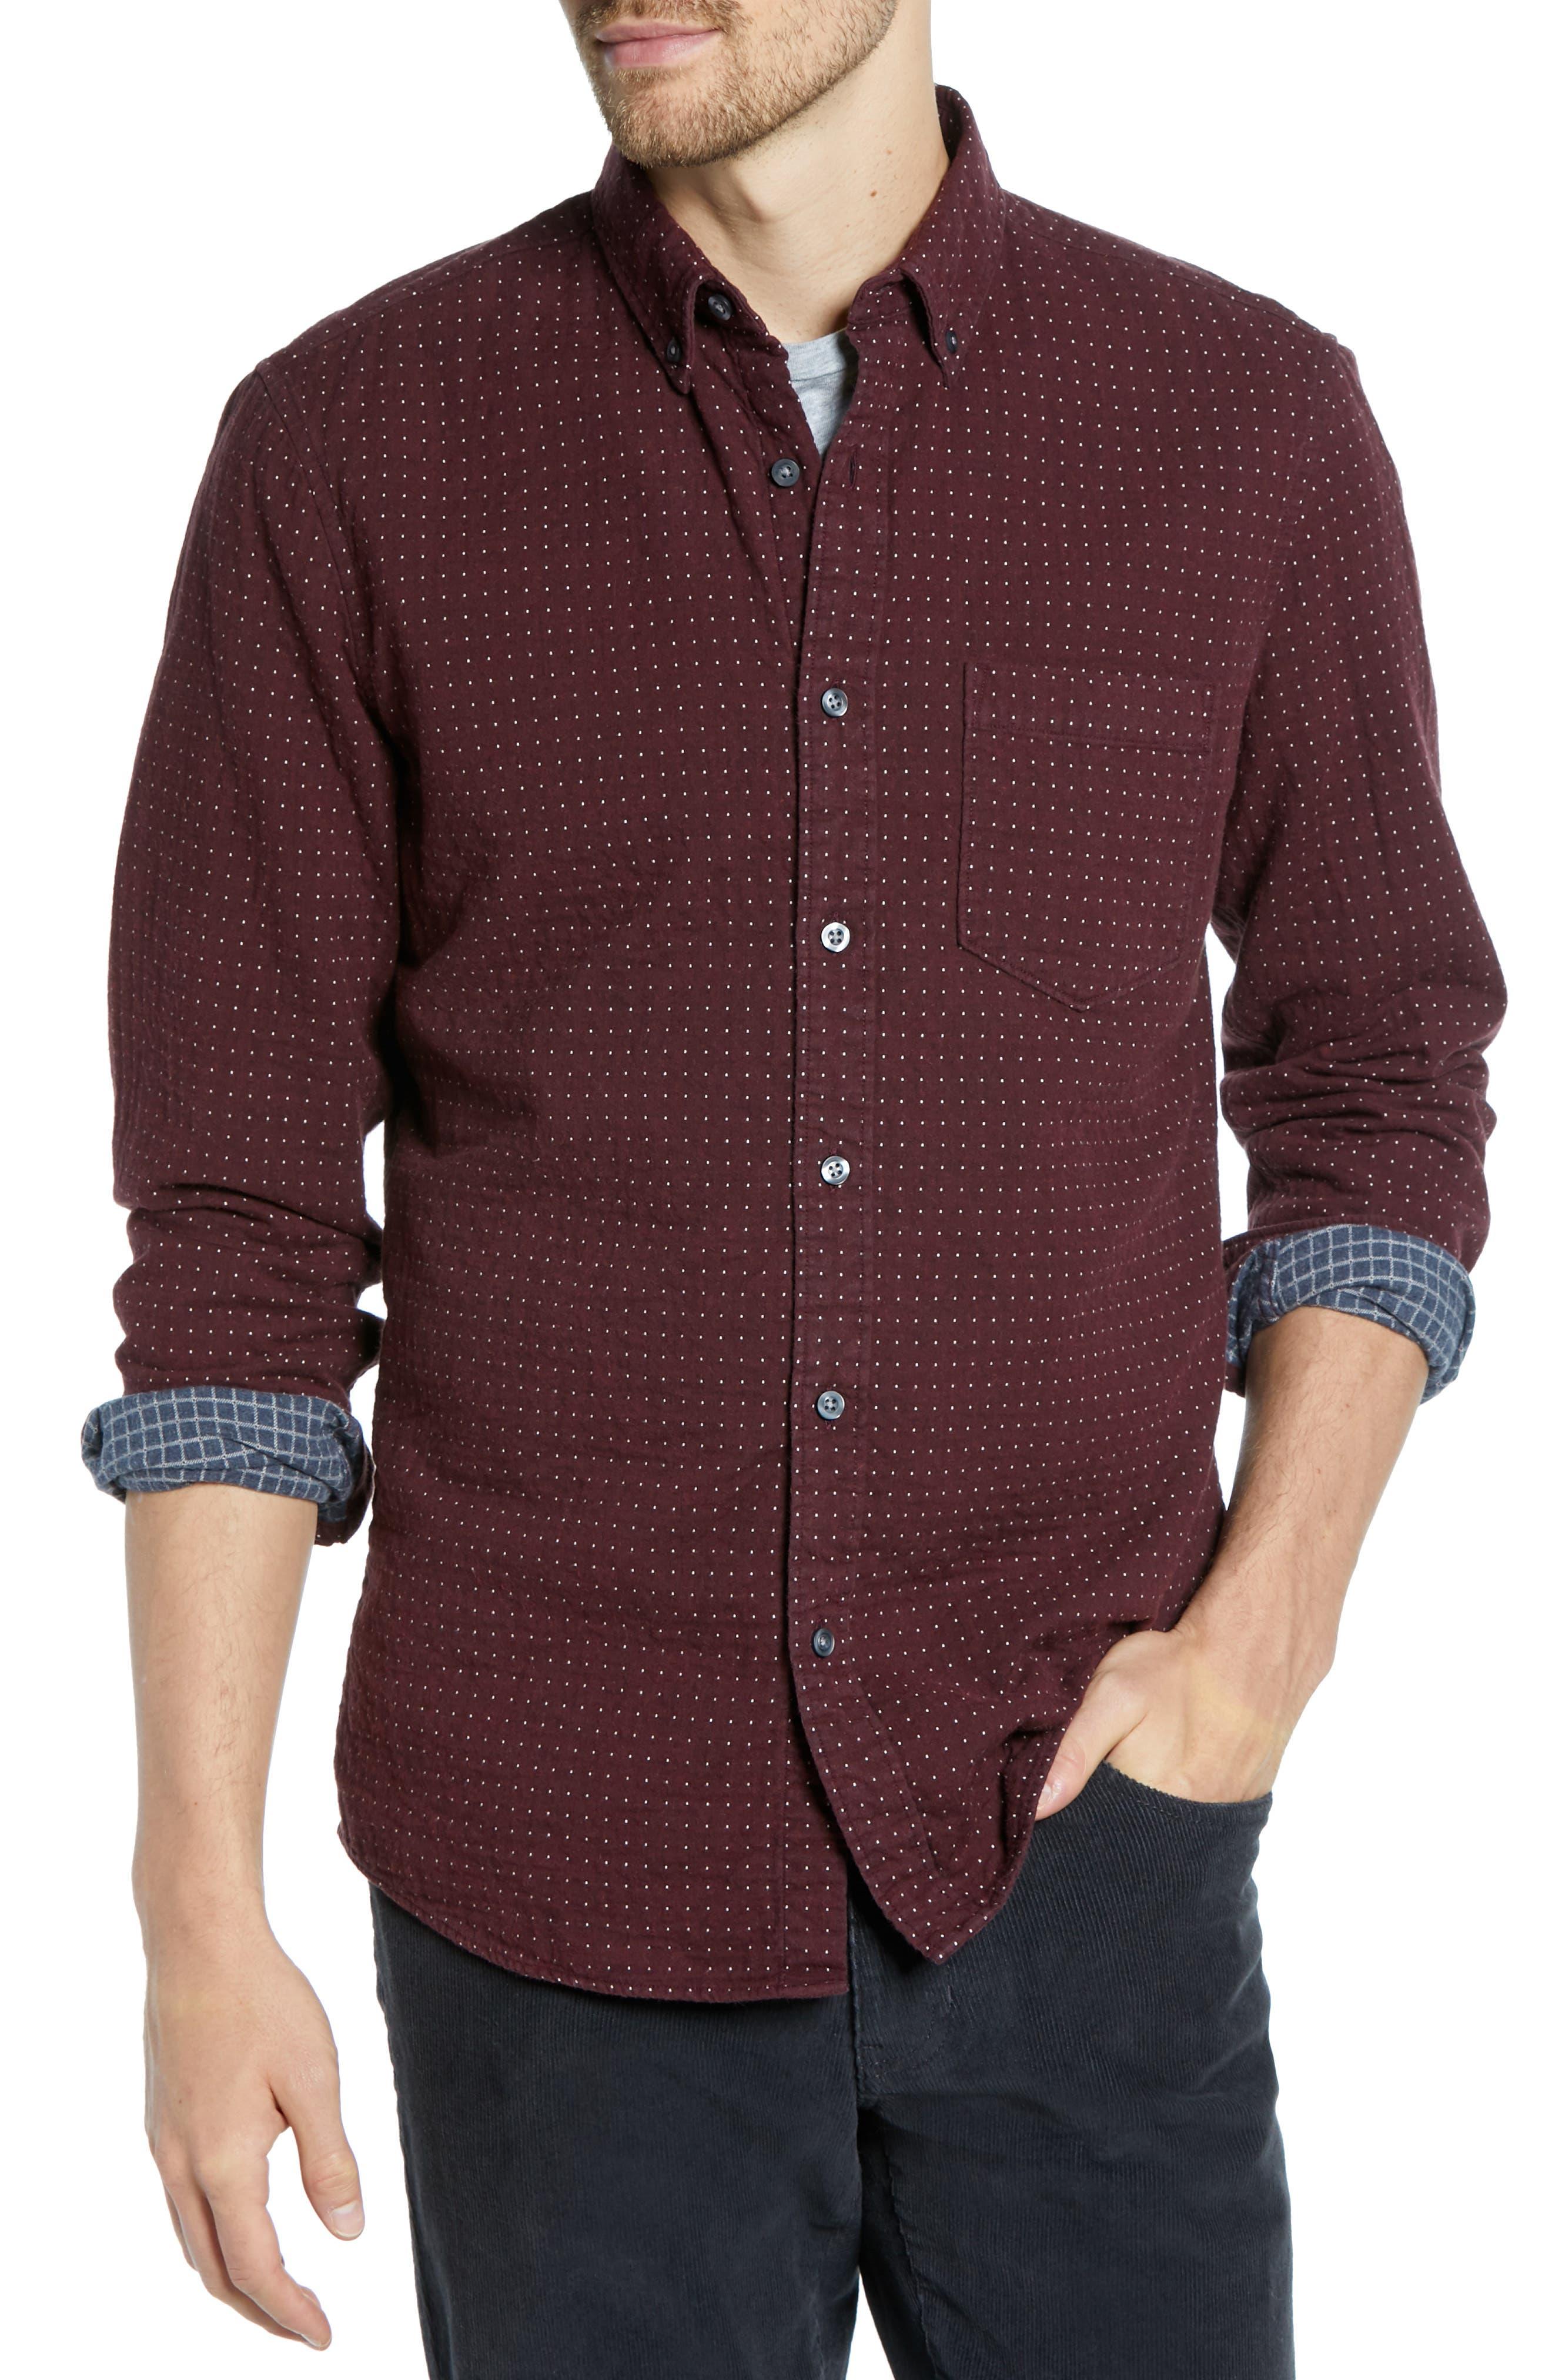 Trim Fit Dot Flannel Sport Shirt,                         Main,                         color, BURGUNDY ROYALE GREY DUOFOLD